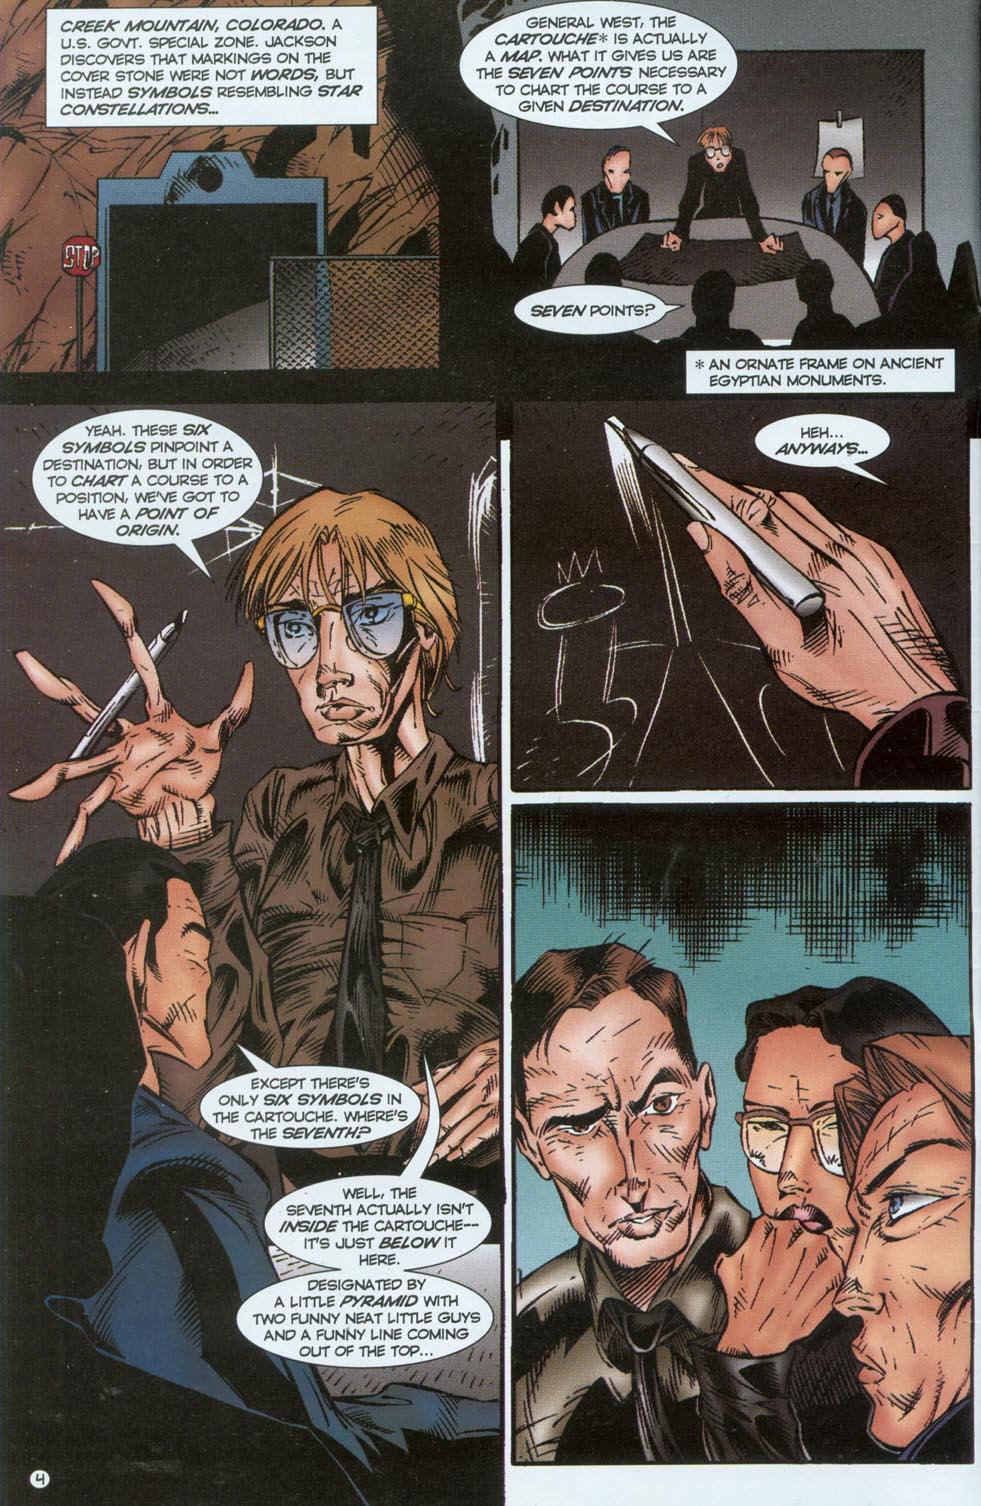 Read online Stargate comic -  Issue #1 - 6